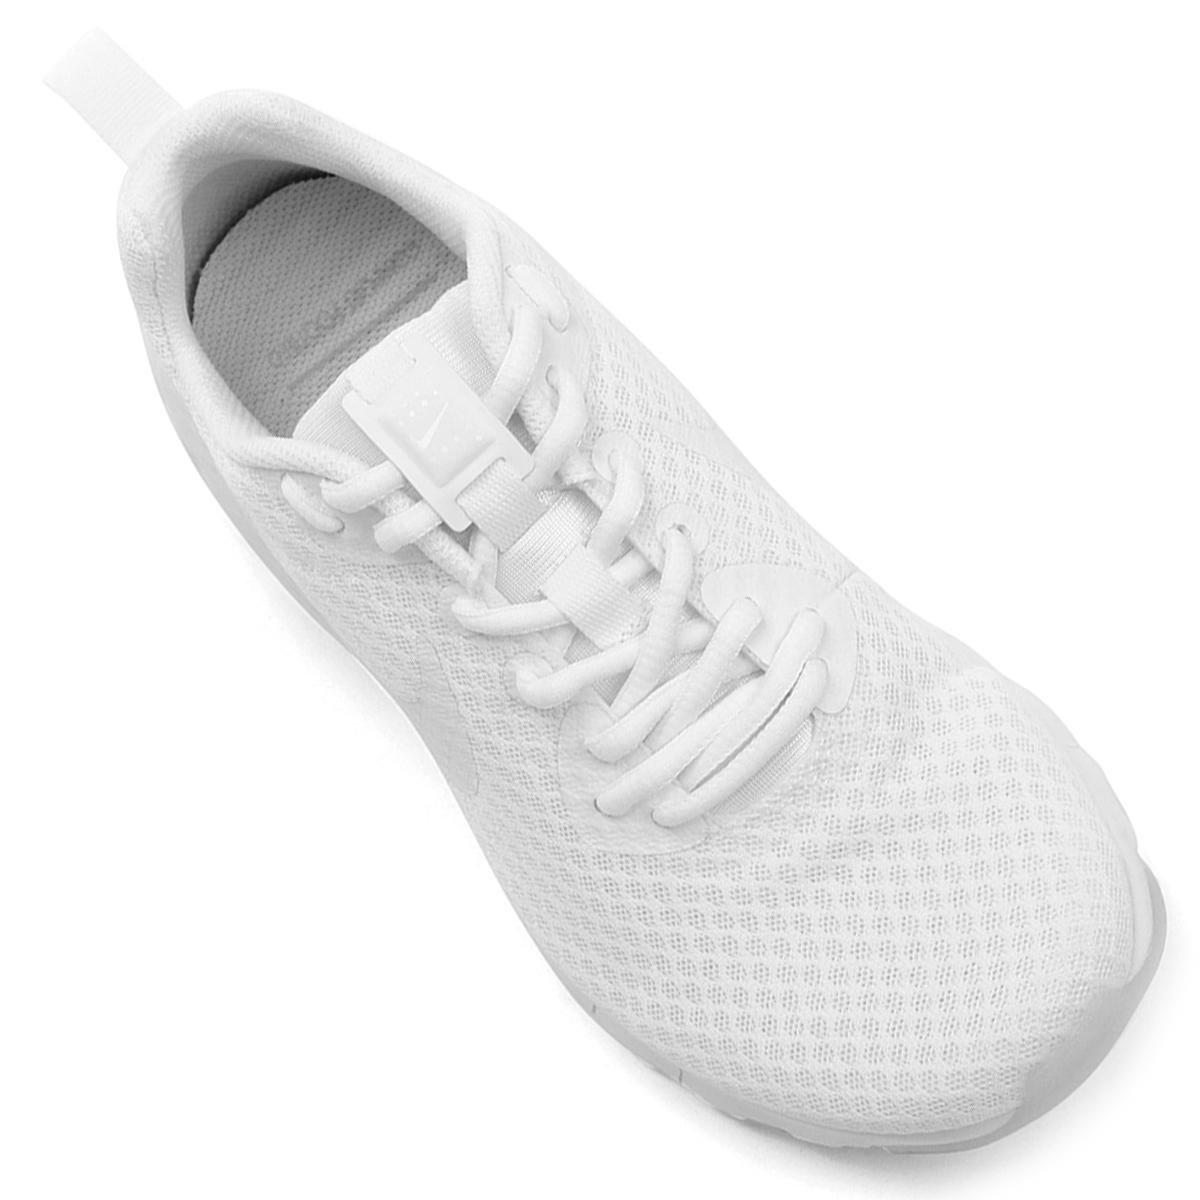 Tênis Nike Air Max Motion Lw Feminino - Compre Agora  4d51b59c11f2d